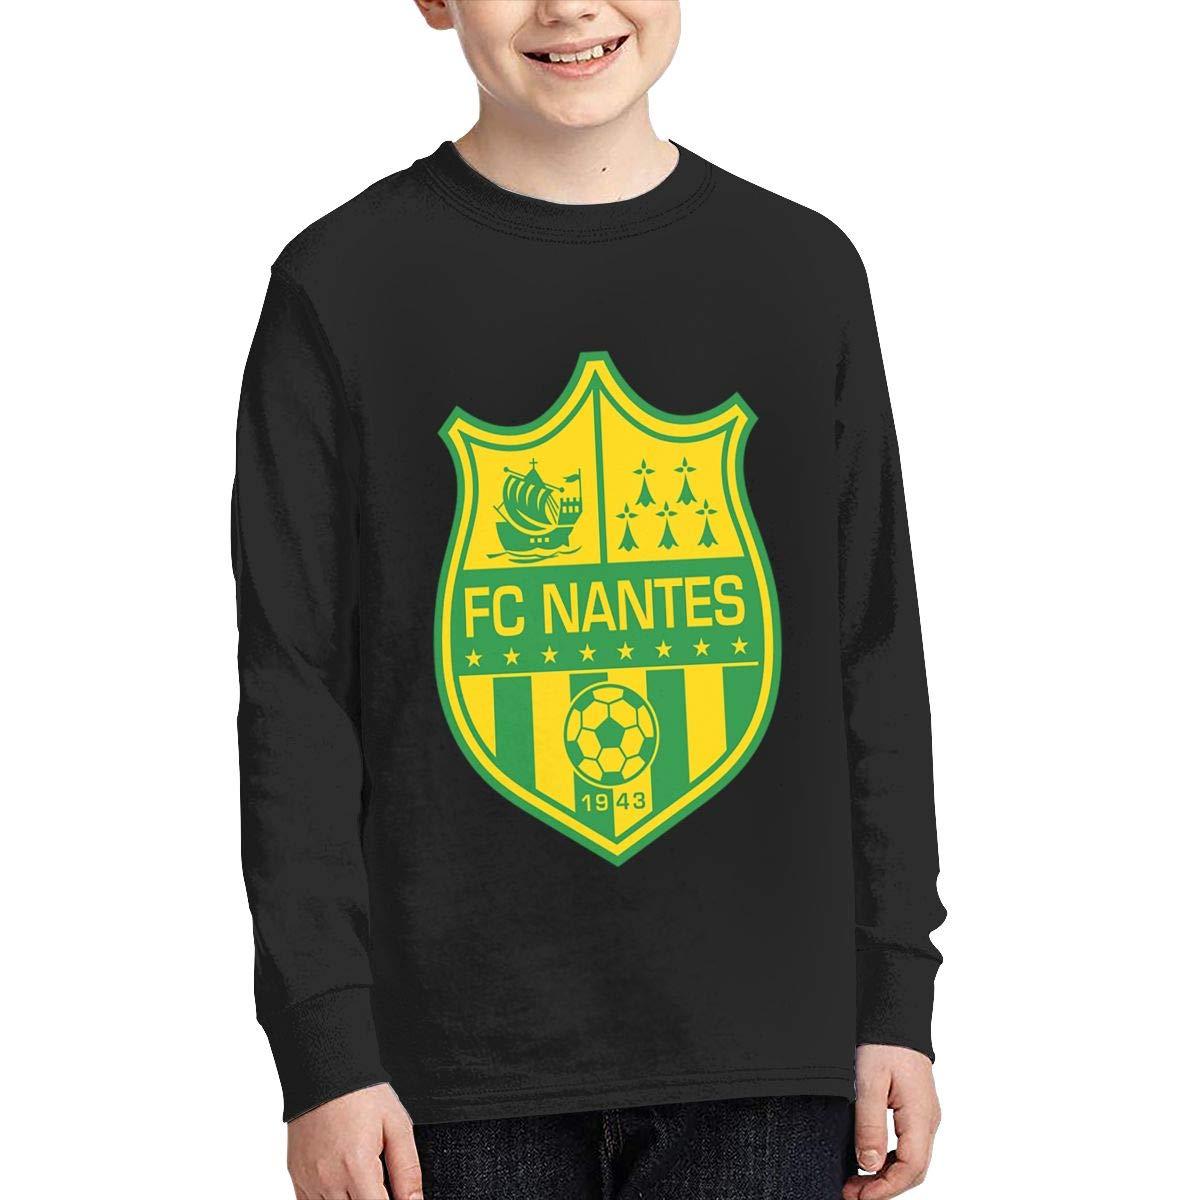 RyanCSchmitt FC Nantes Youth Boys Girls Crew Neck Long Sleeves T Shirt Fashion Youth Tee Shirts